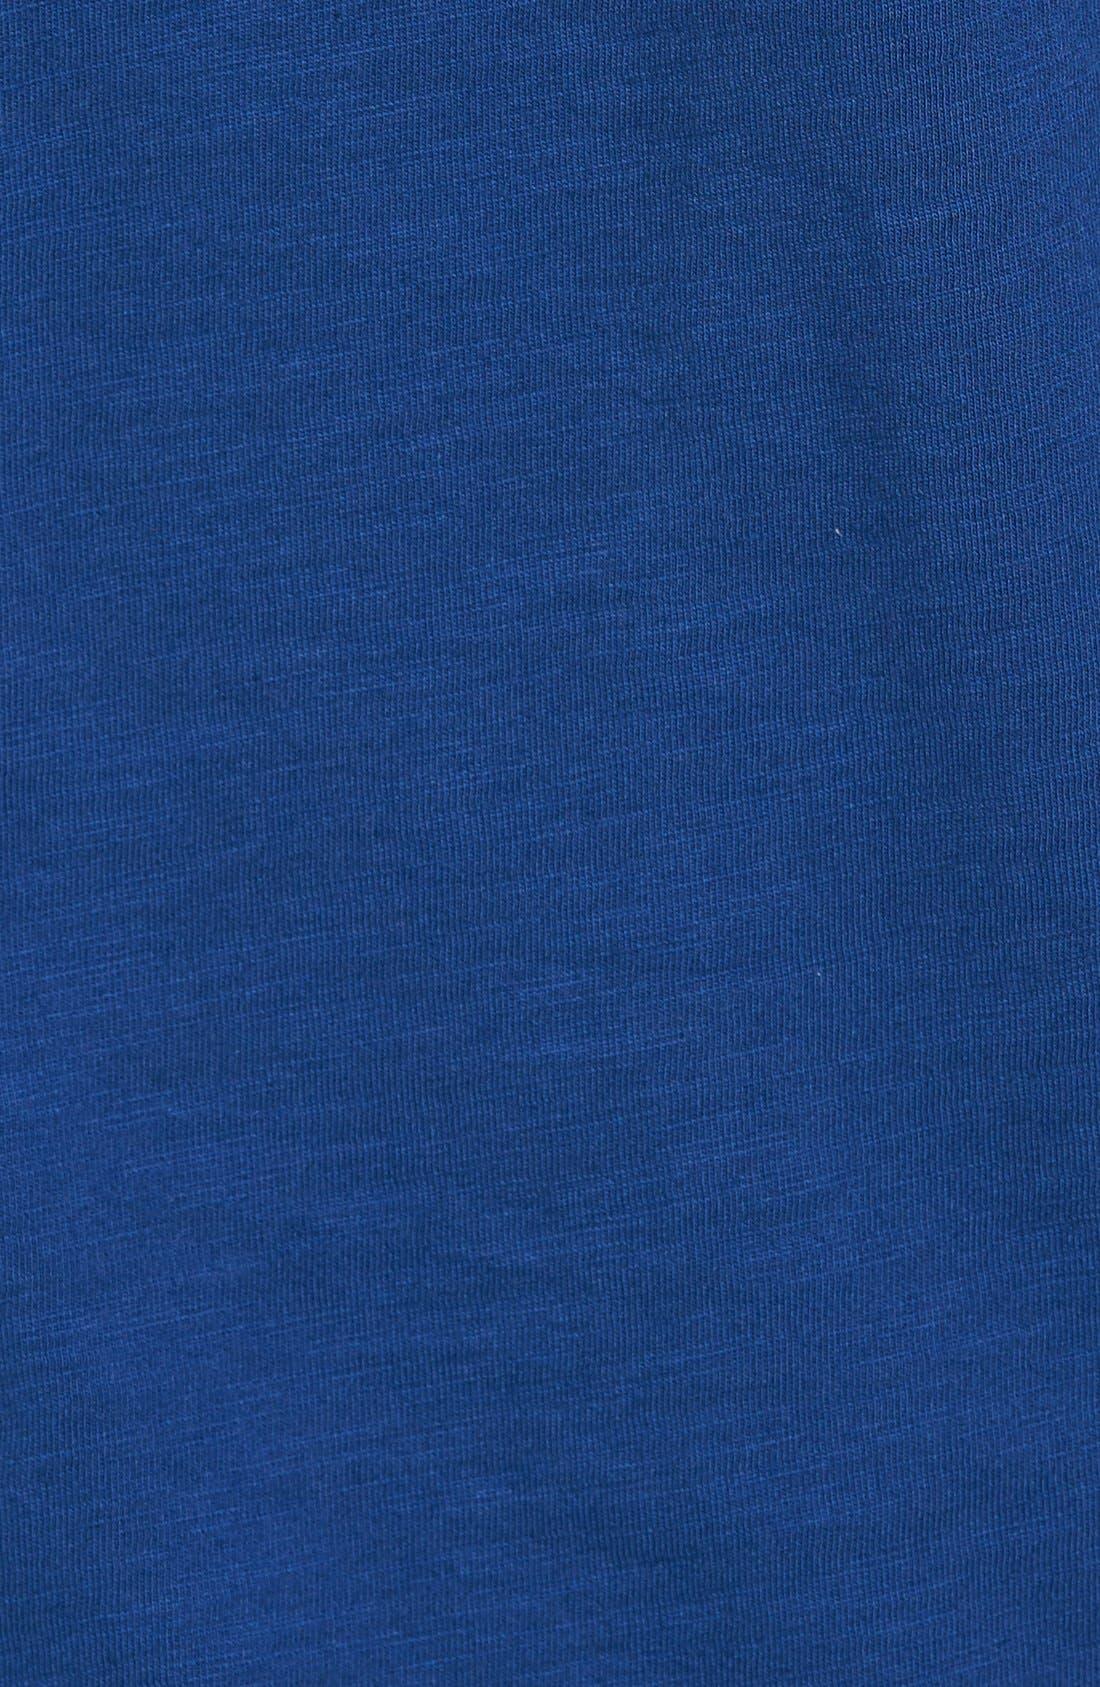 Alternate Image 5  - Southern Tide 'Channel Marker' Graphic Pocket Long Sleeve T-Shirt